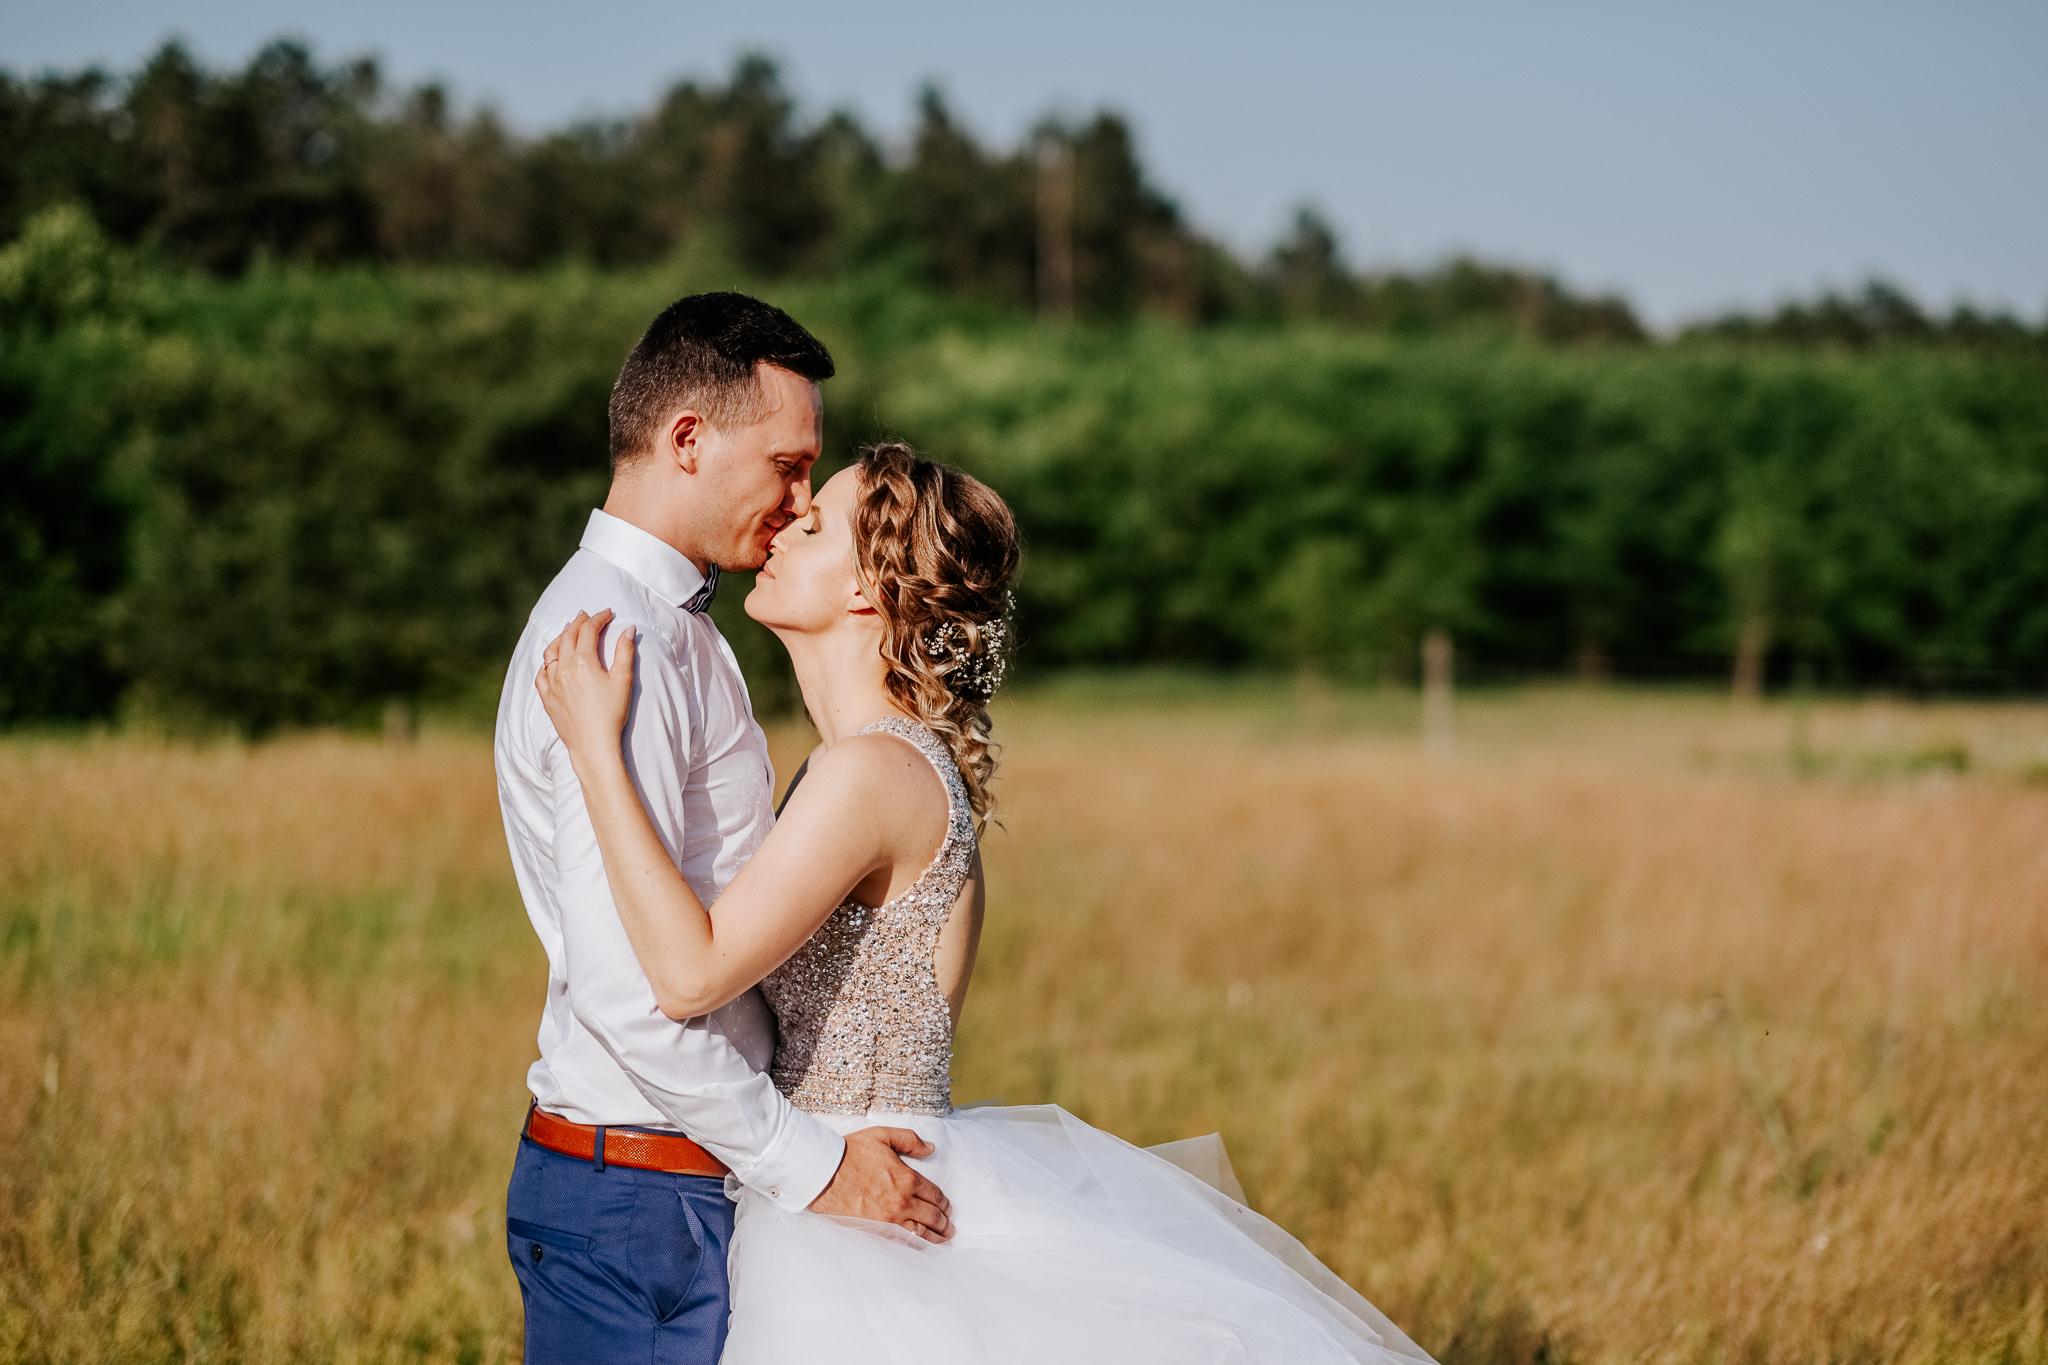 Four-Bites-esküvő-Mira-Norbi